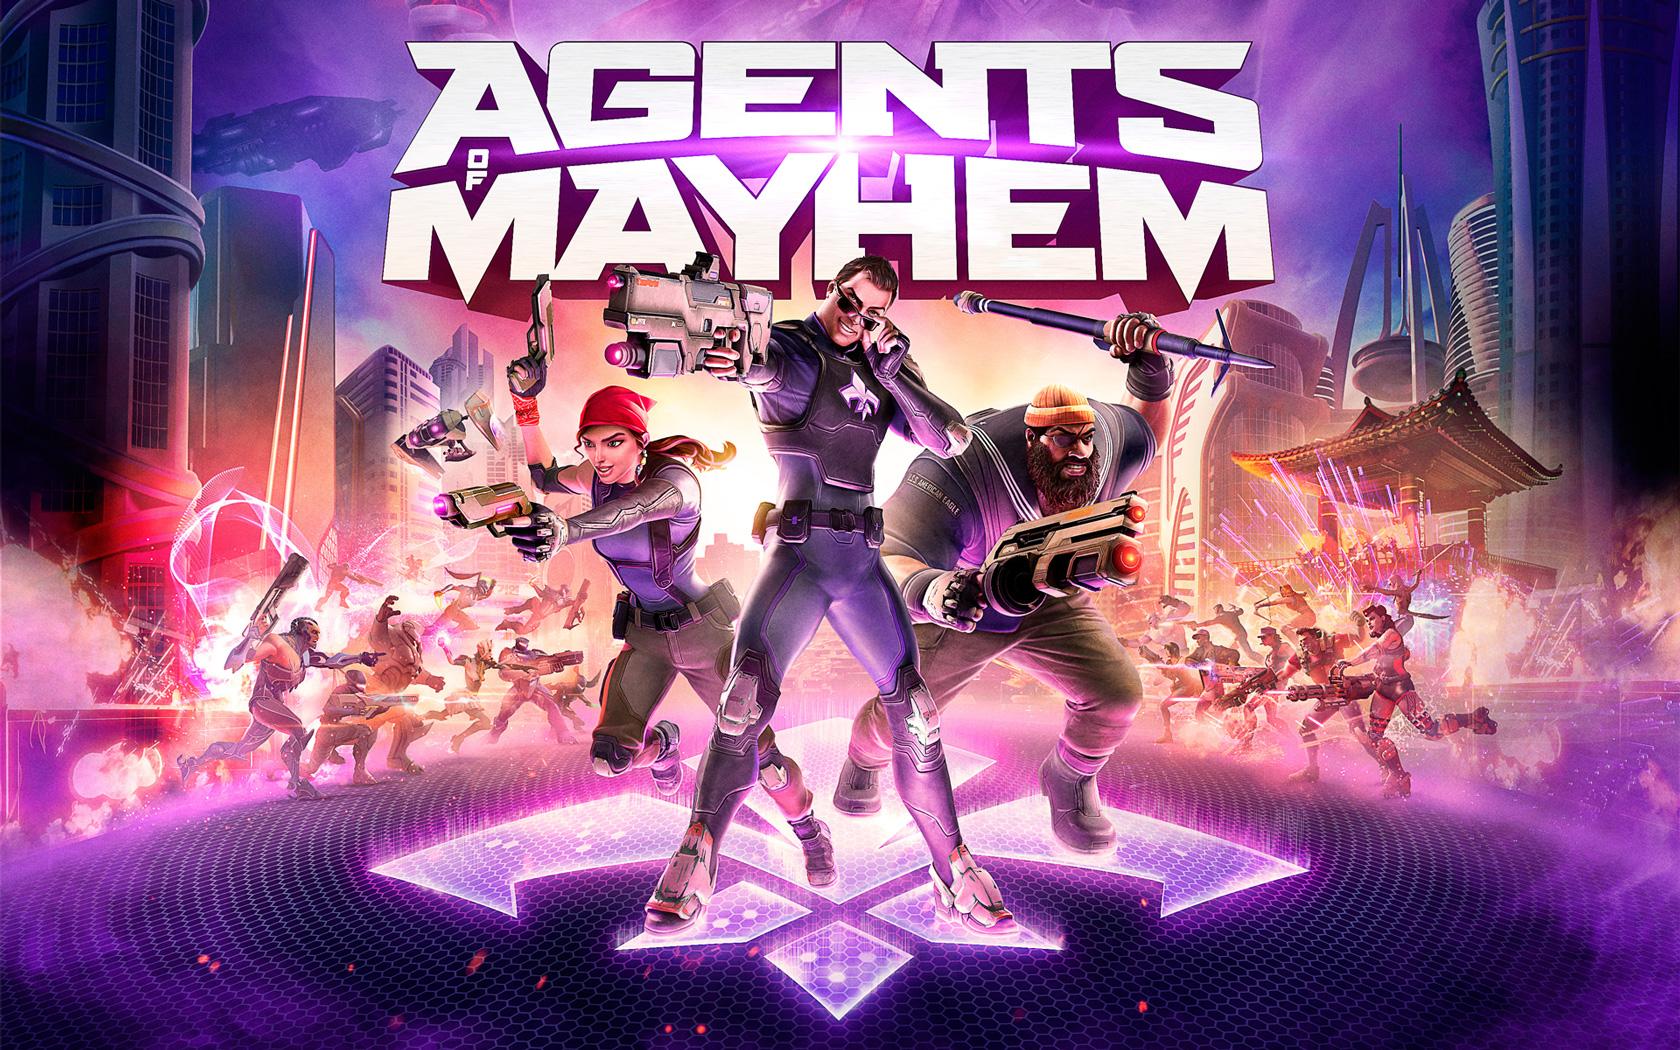 Free Agents of Mayhem Wallpaper in 1680x1050